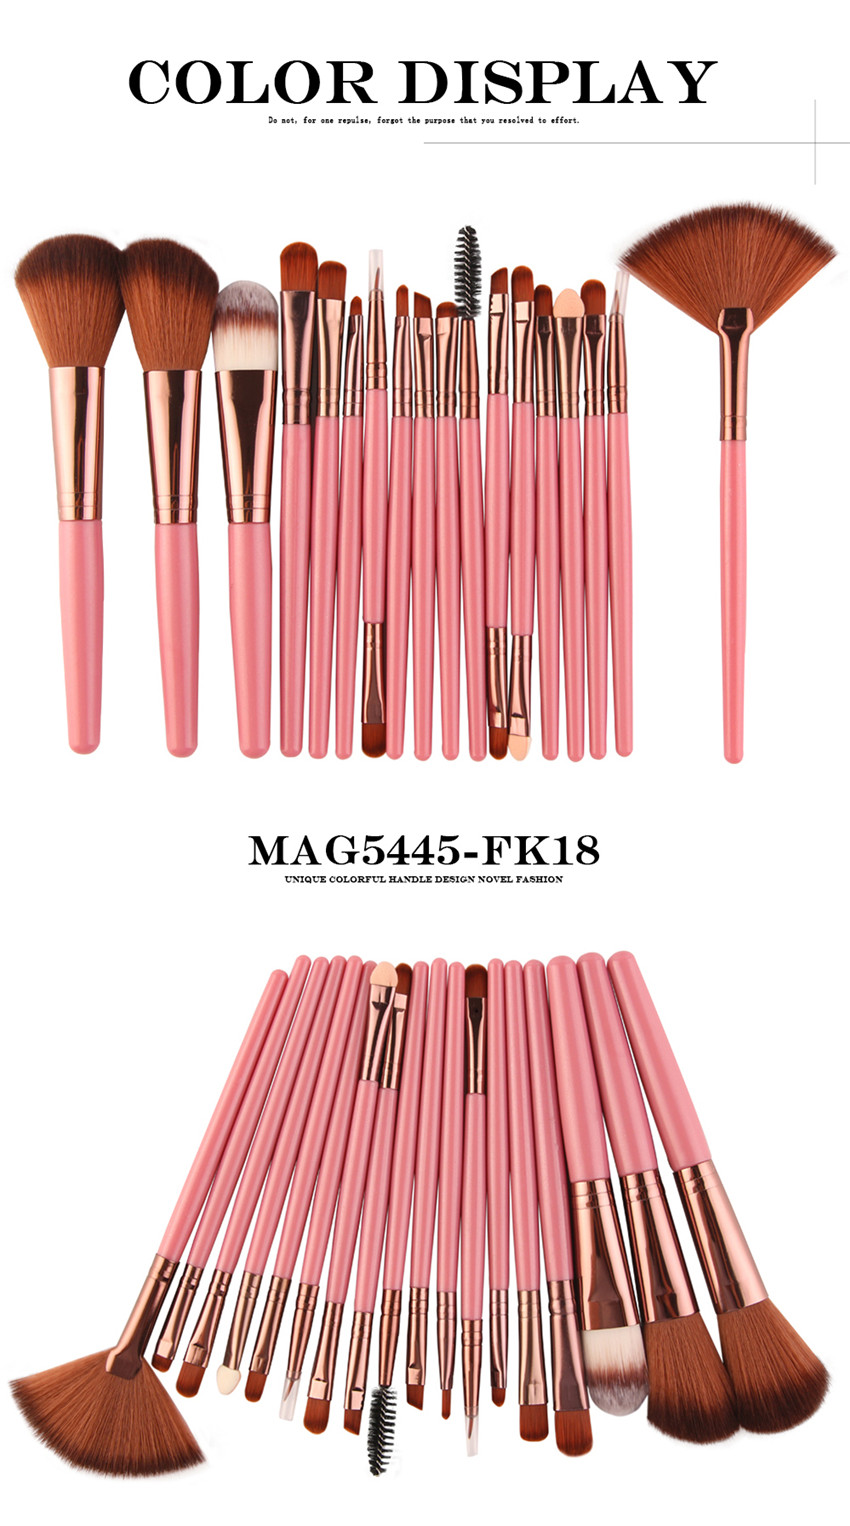 18Pcs/lot Brand Brushes Makeup Brush Set maquiagem Cosmetics Power Foundation Blush Eye Shadow Blending Fan Make Up Kits Beauty 7